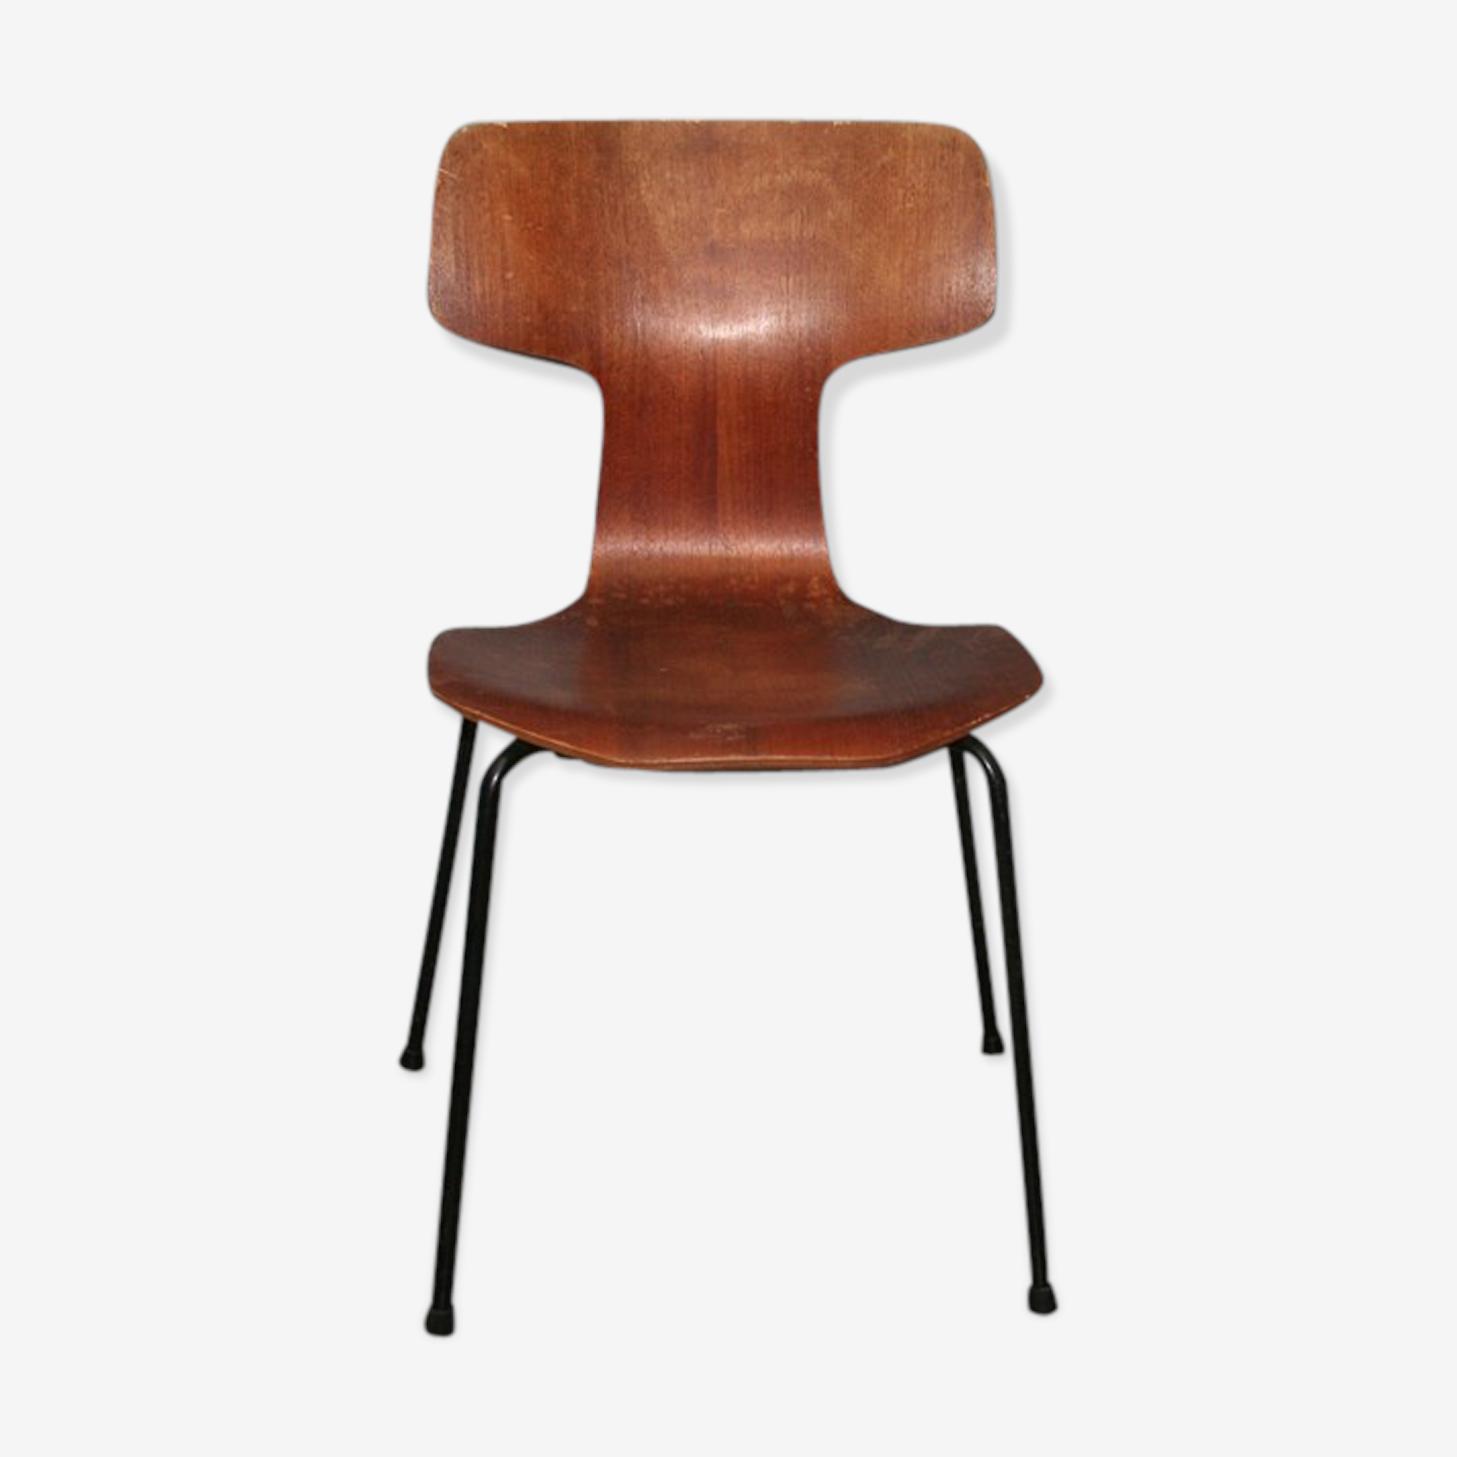 Chaise marteau Arne Jacobsen Fritz Hansen vintage 1969